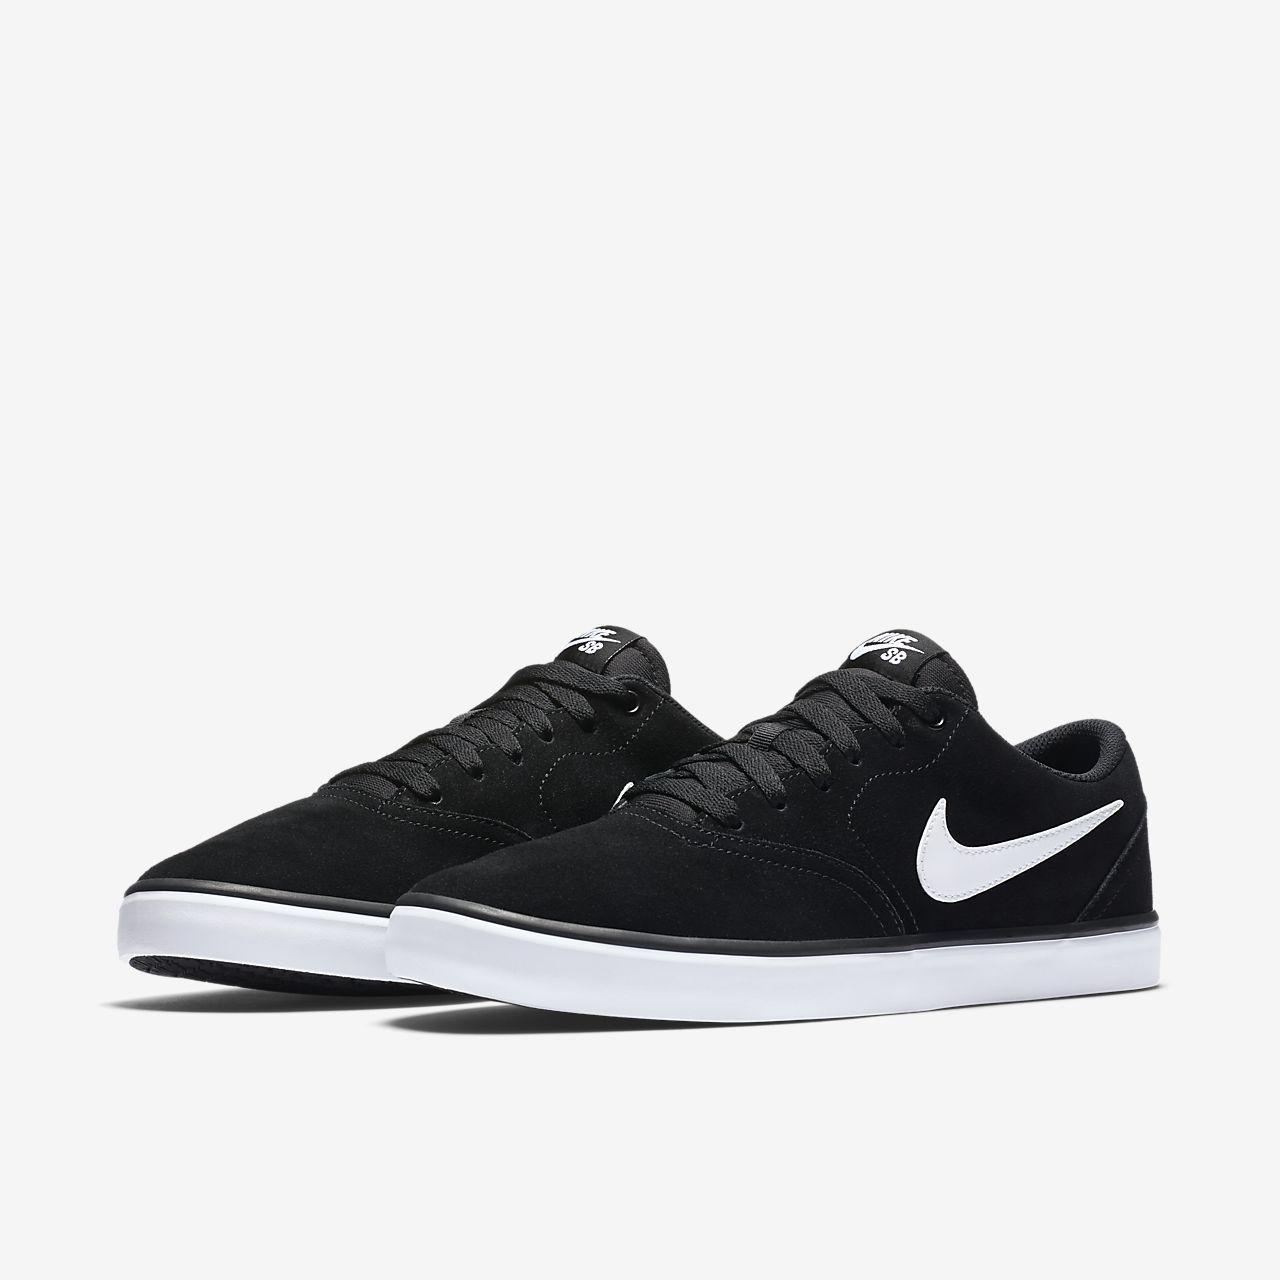 Nike SolarSoft Run Hombre US 12 Negro Zapatillas hkUREfvzGK